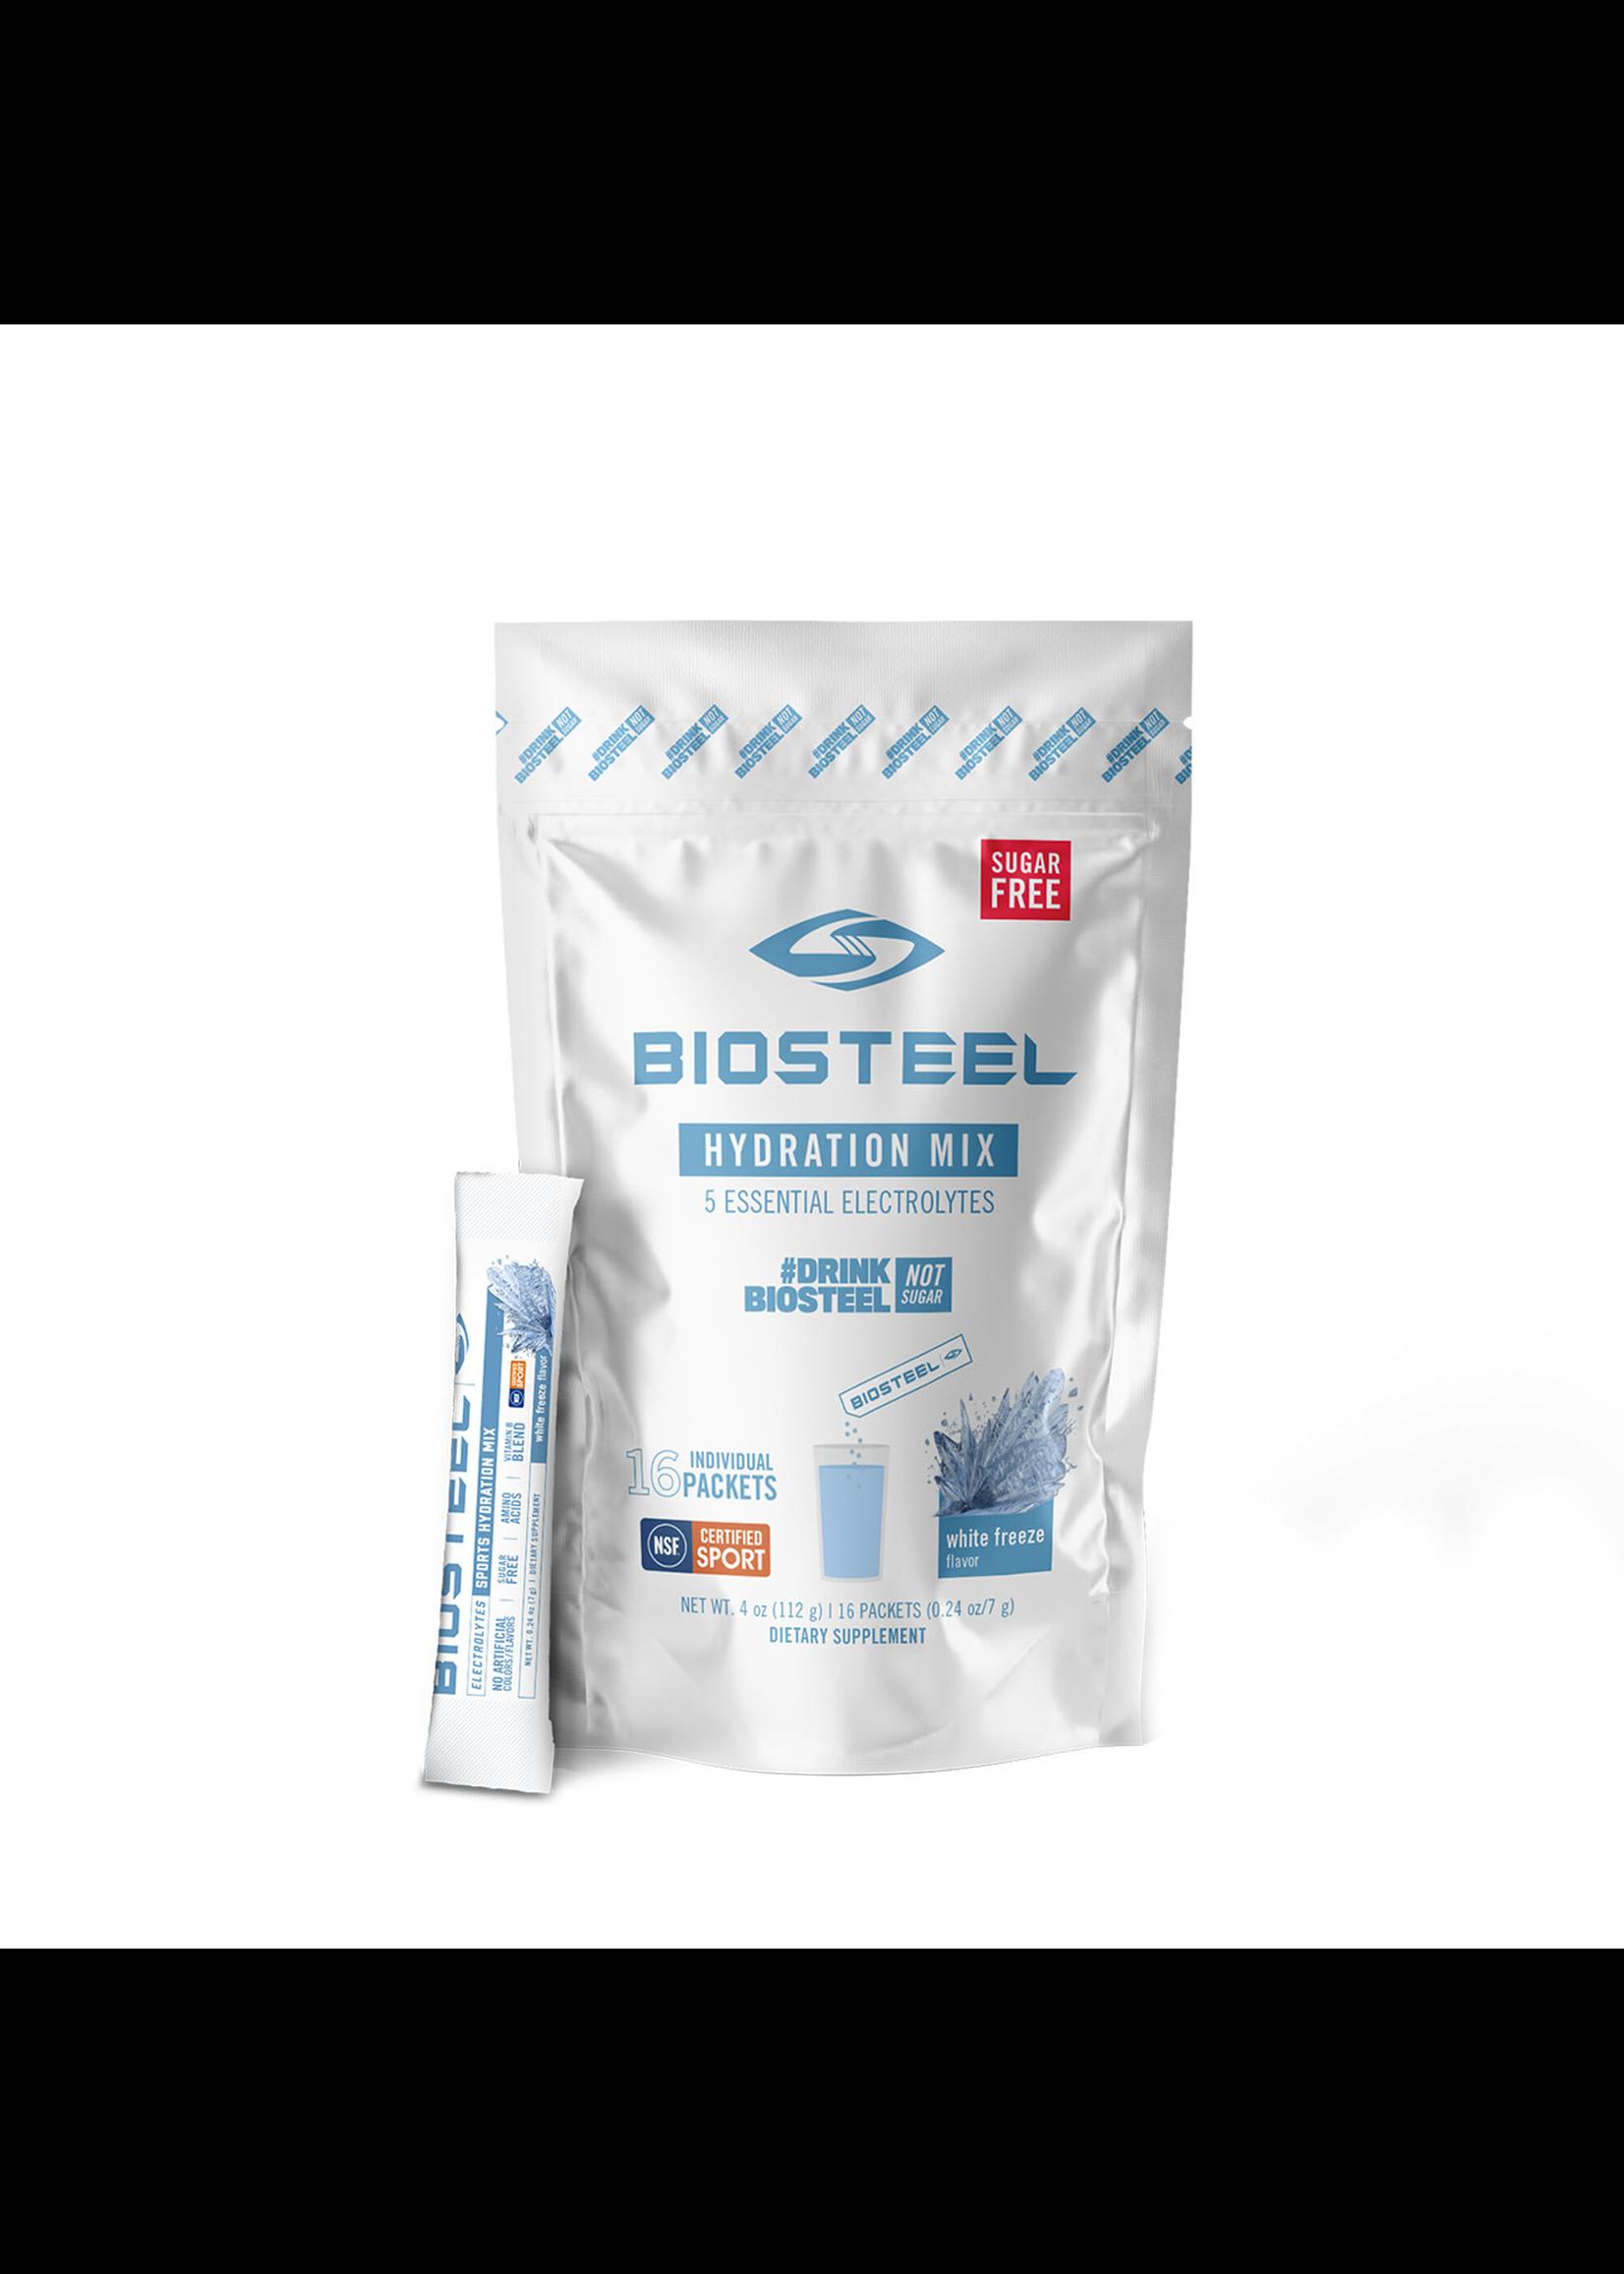 BIOSTEEL 16 TUBES HYDRATION MIX